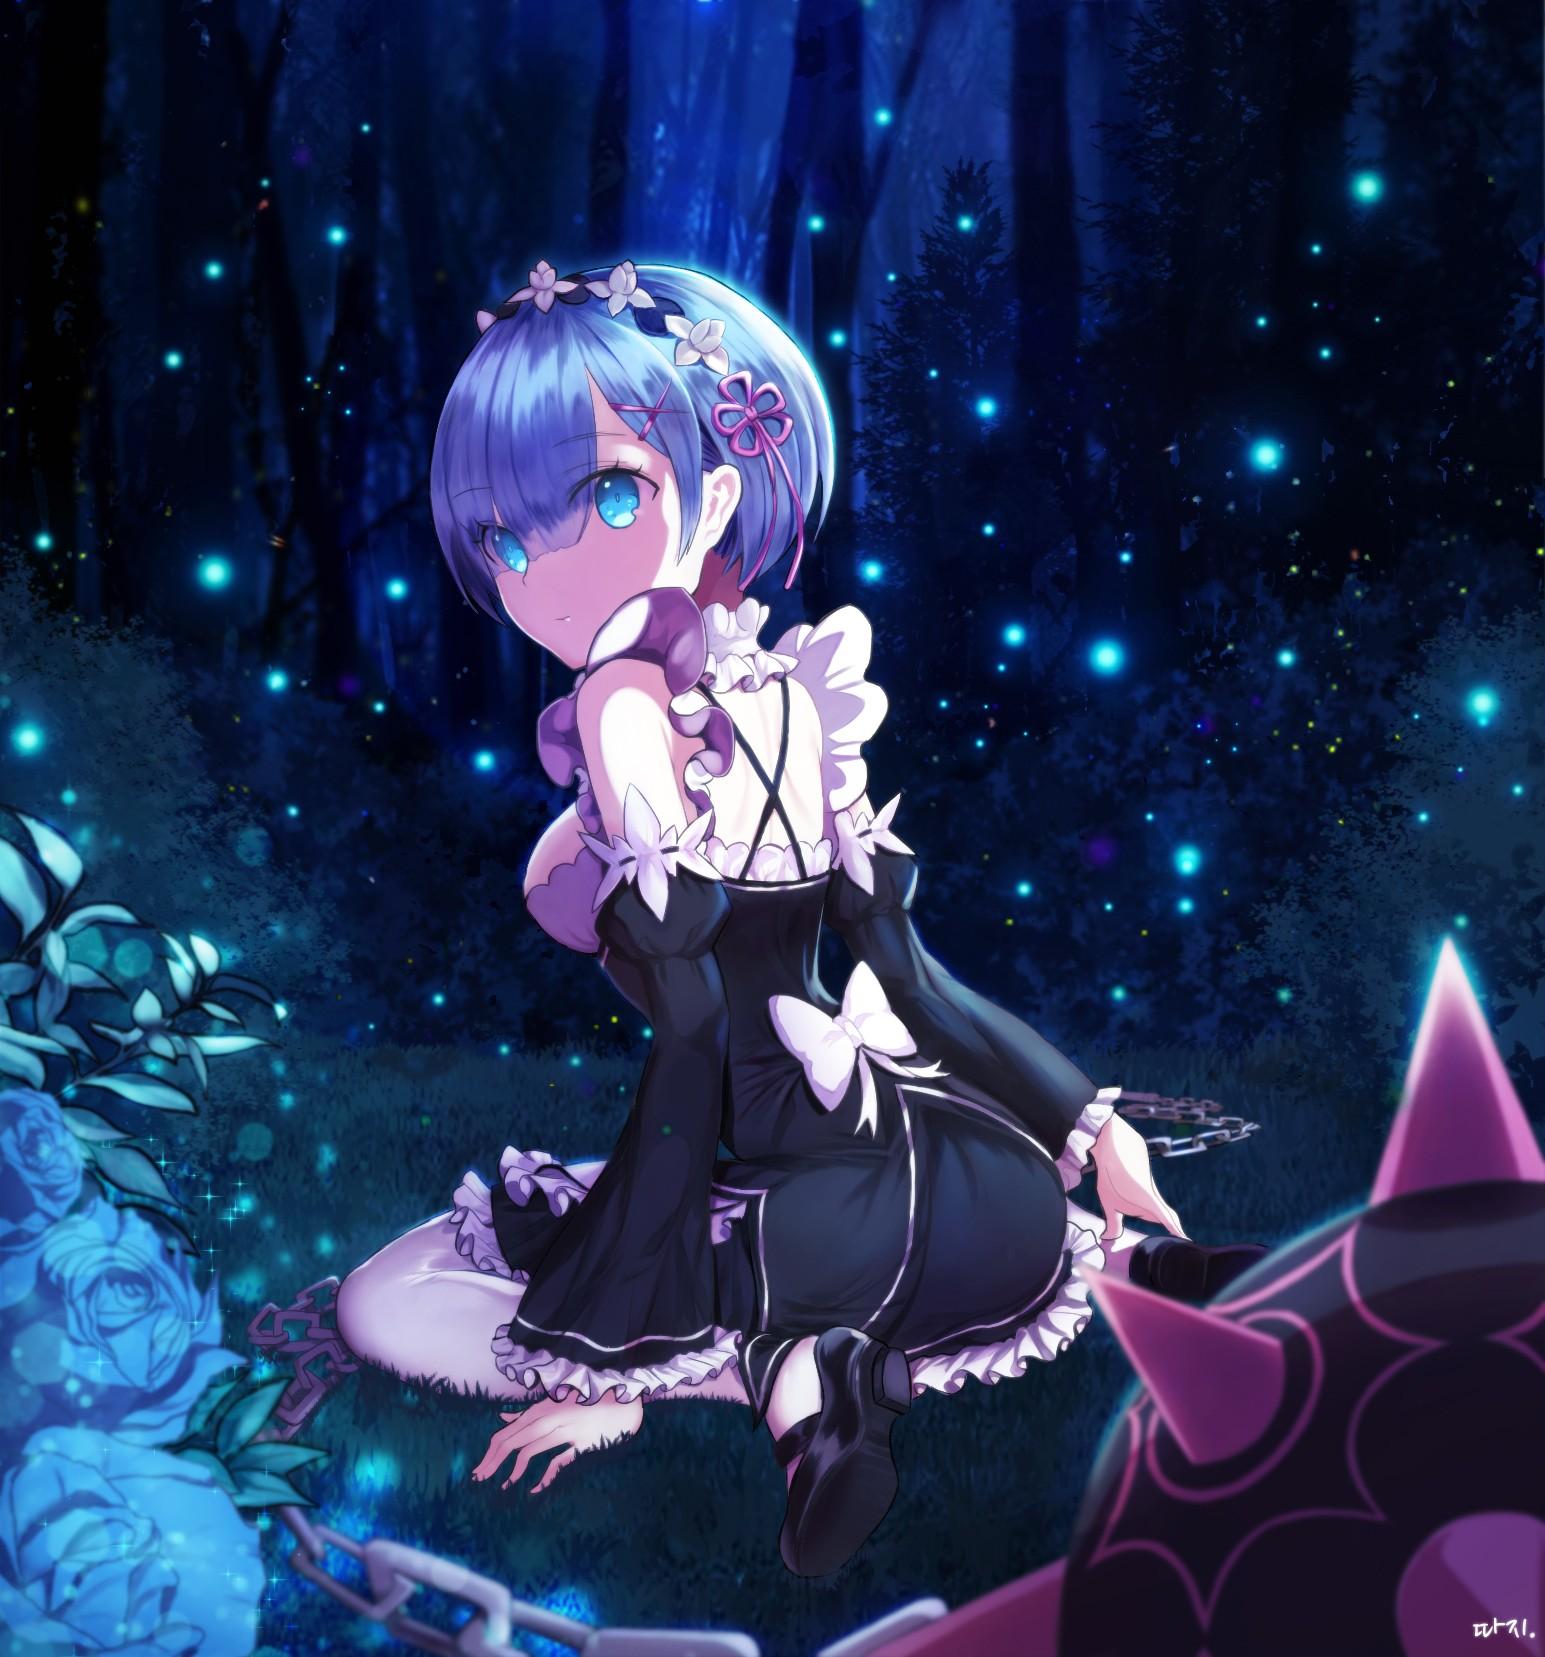 Anime 1545x1657 Re:Zero Kara Hajimeru Isekai Seikatsu Rem (Re: Zero) maid outfit short hair blue hair blue eyes trees forest weapon chains blue rose plants